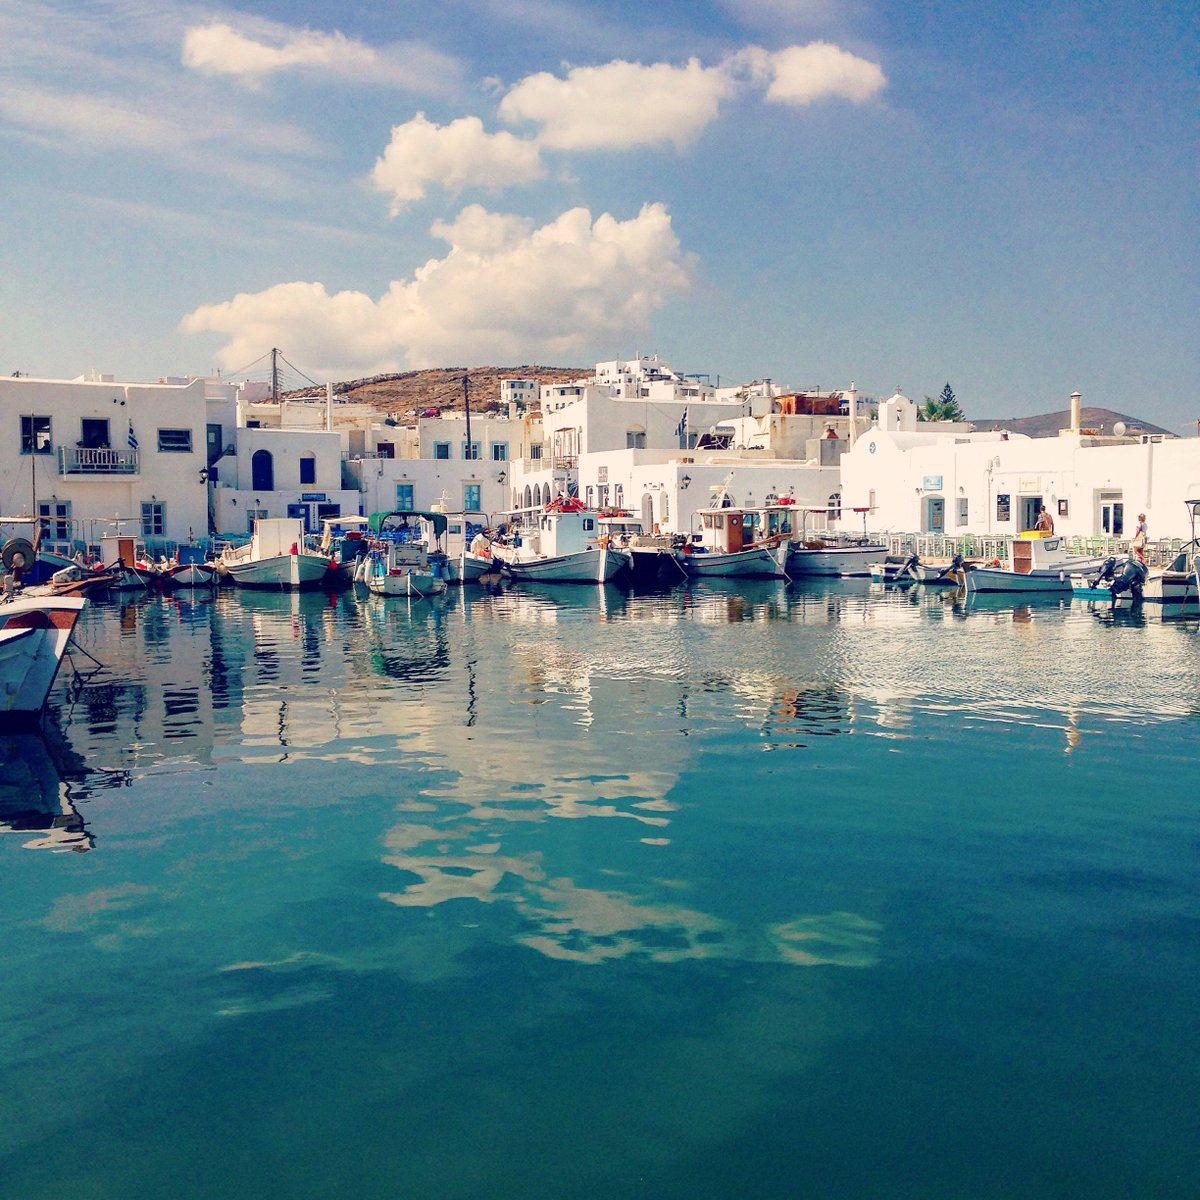 Paros, greece, is a jam